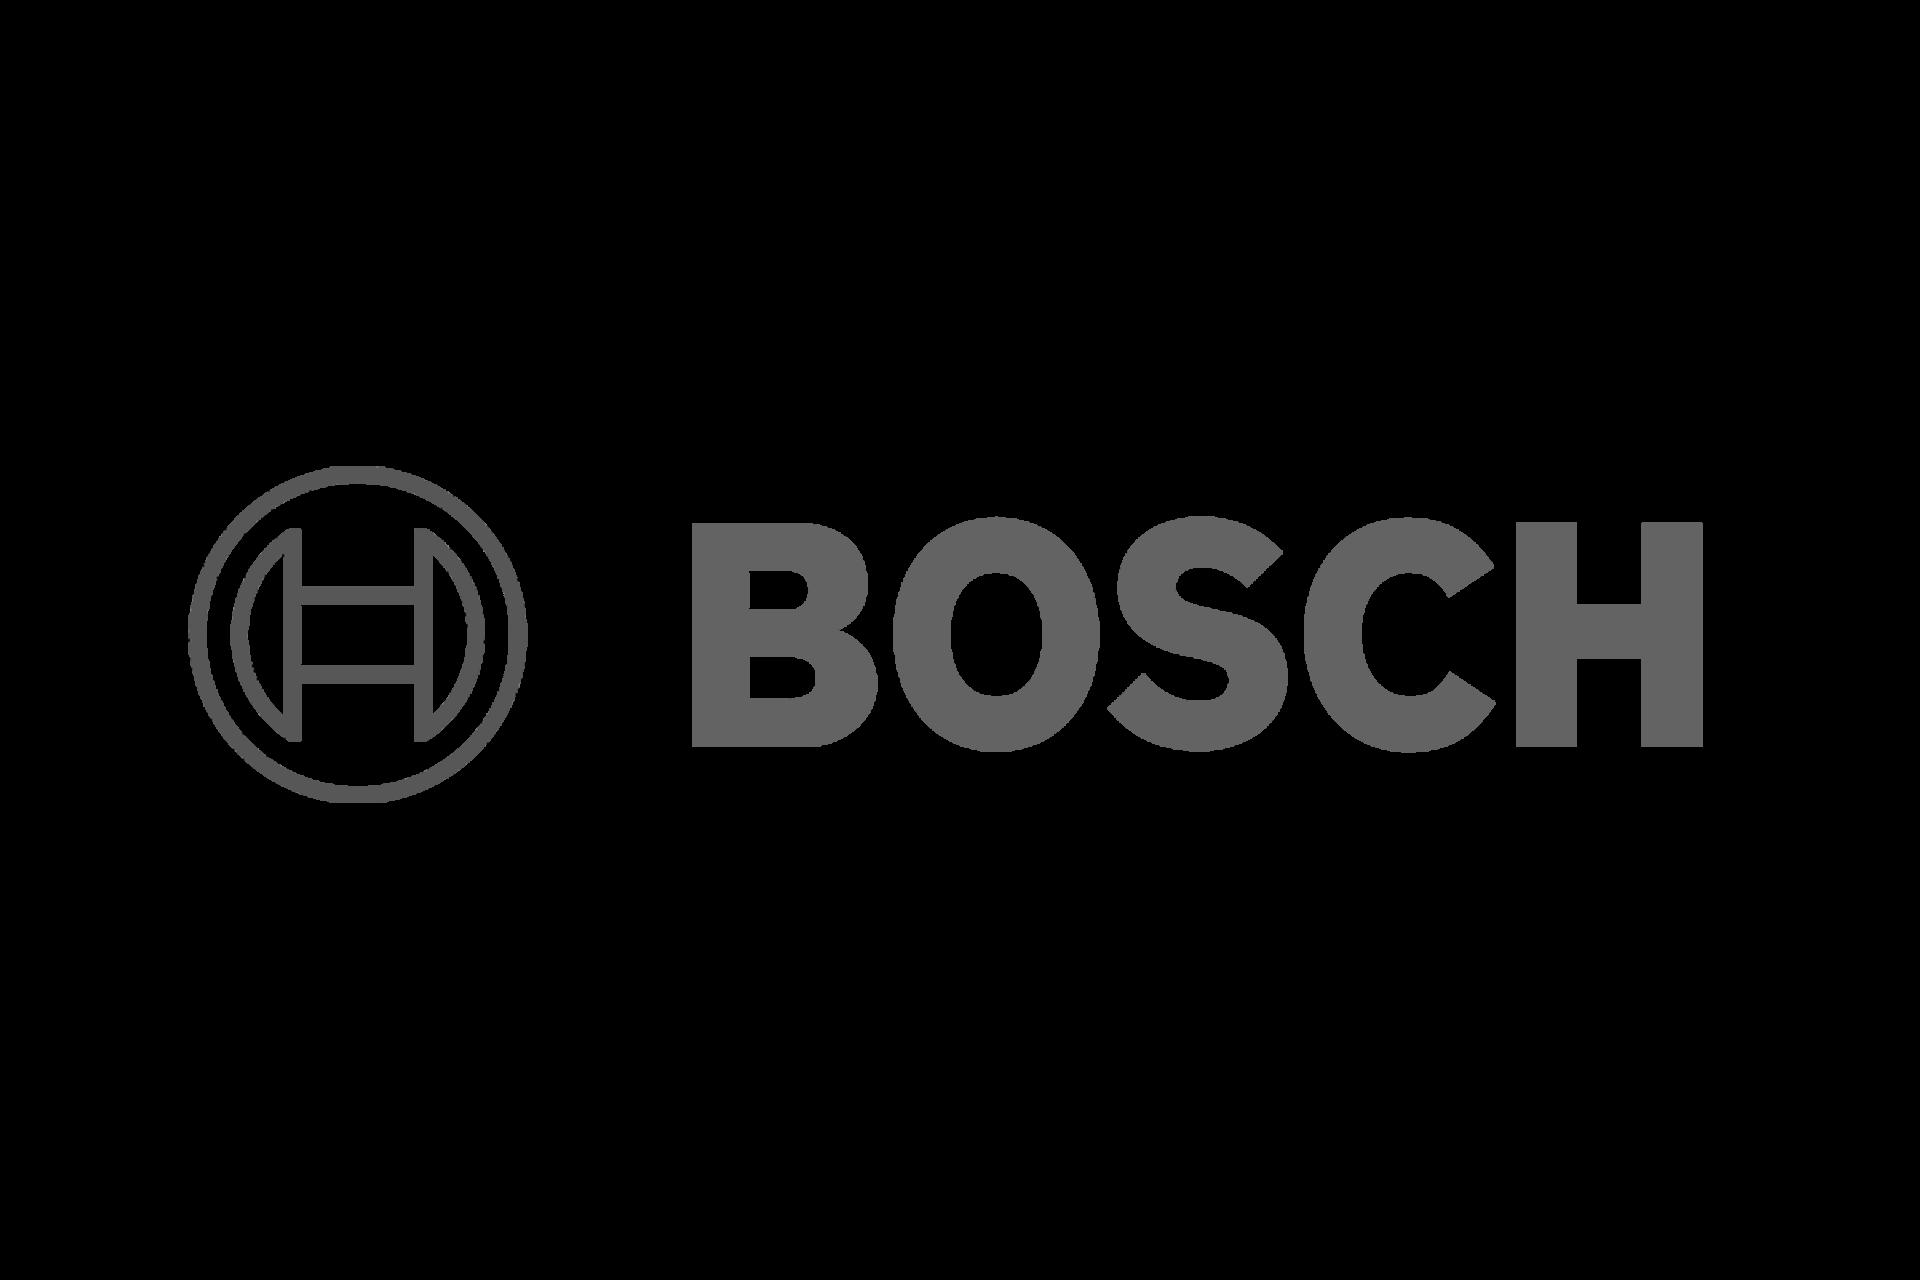 bosch referenz jentner metallveredelung logo sw